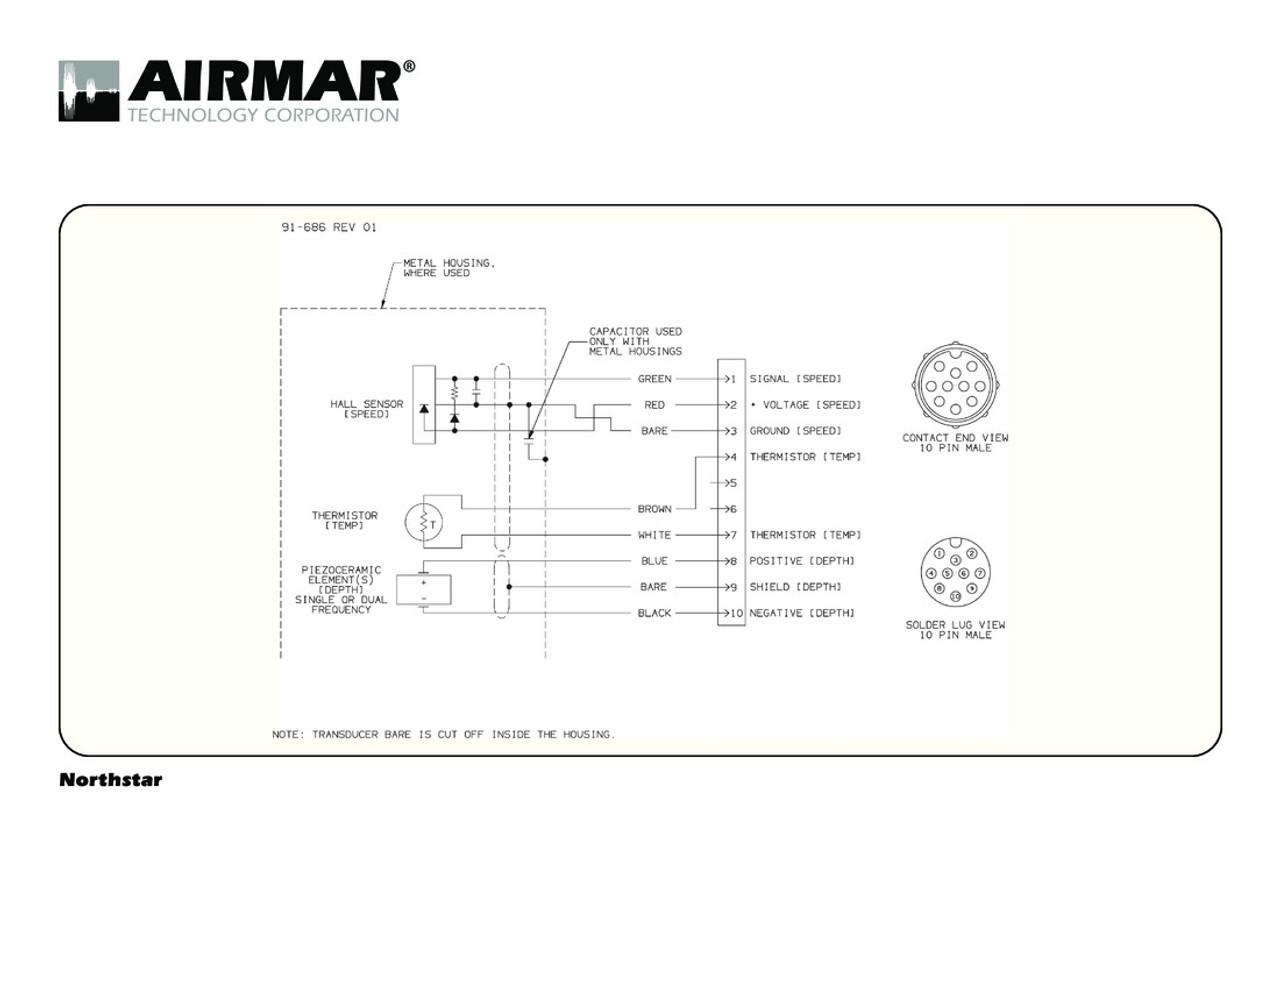 medium resolution of garmin 4 pinwiring diagram wiring diagram schemagps 4 pin wiring diagram wiring diagram data schema garmin